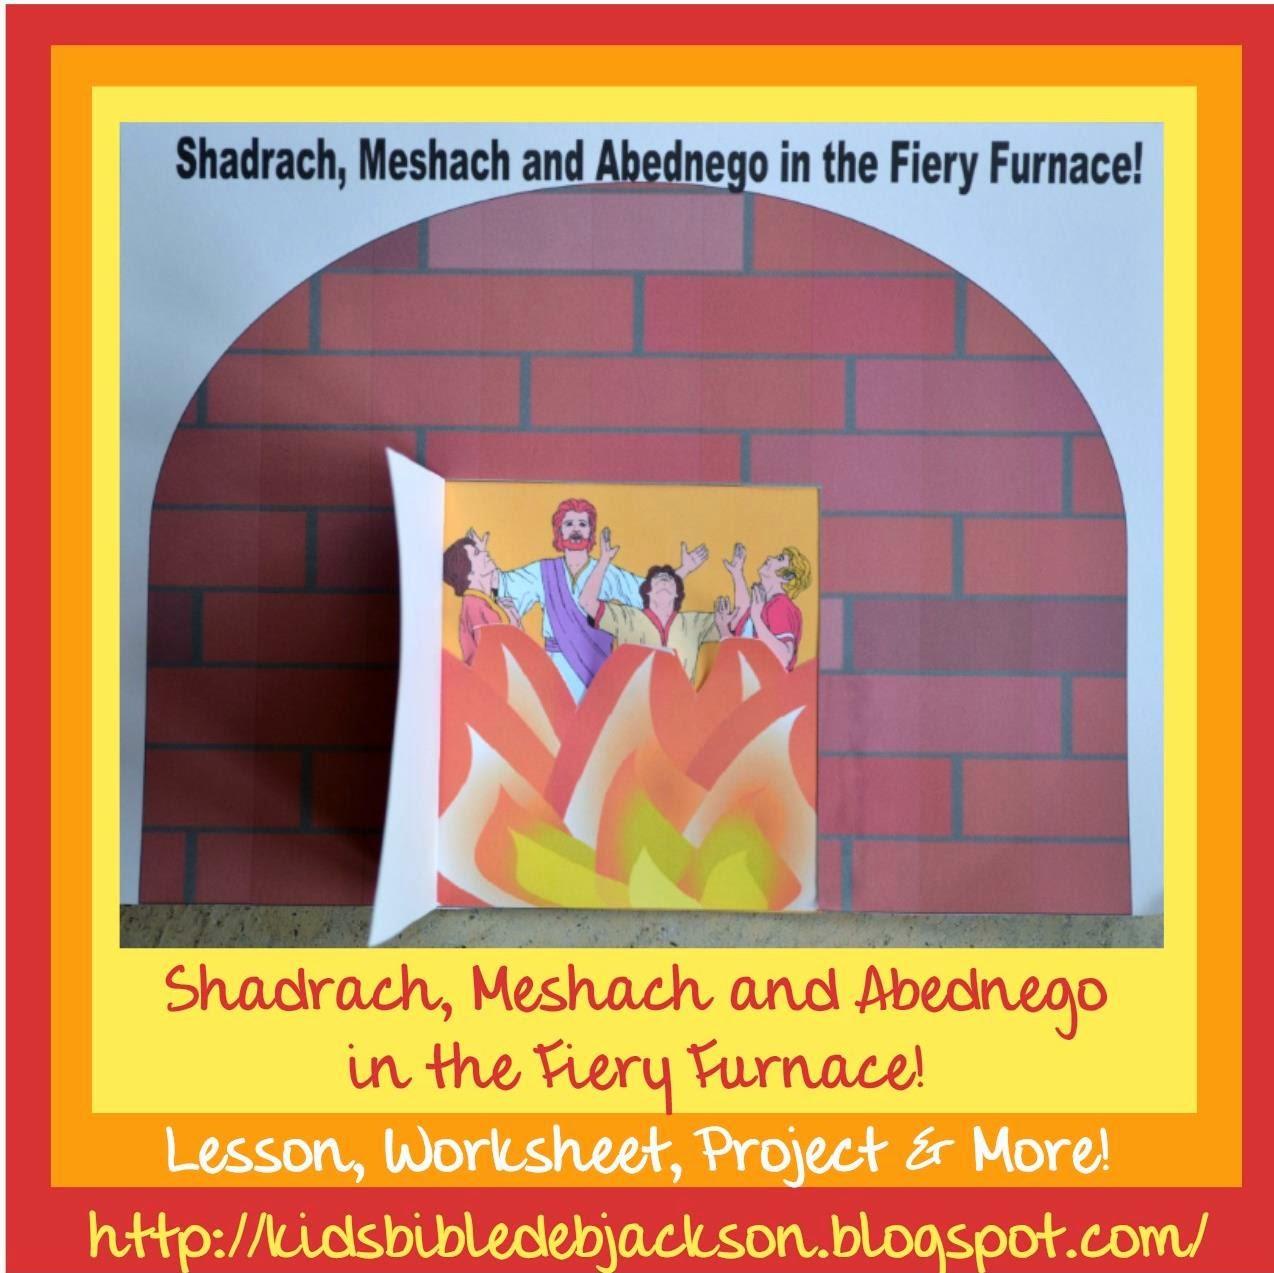 http://kidsbibledebjackson.blogspot.com/2014/05/shadrach-meshach-and-abednego-fiery.html